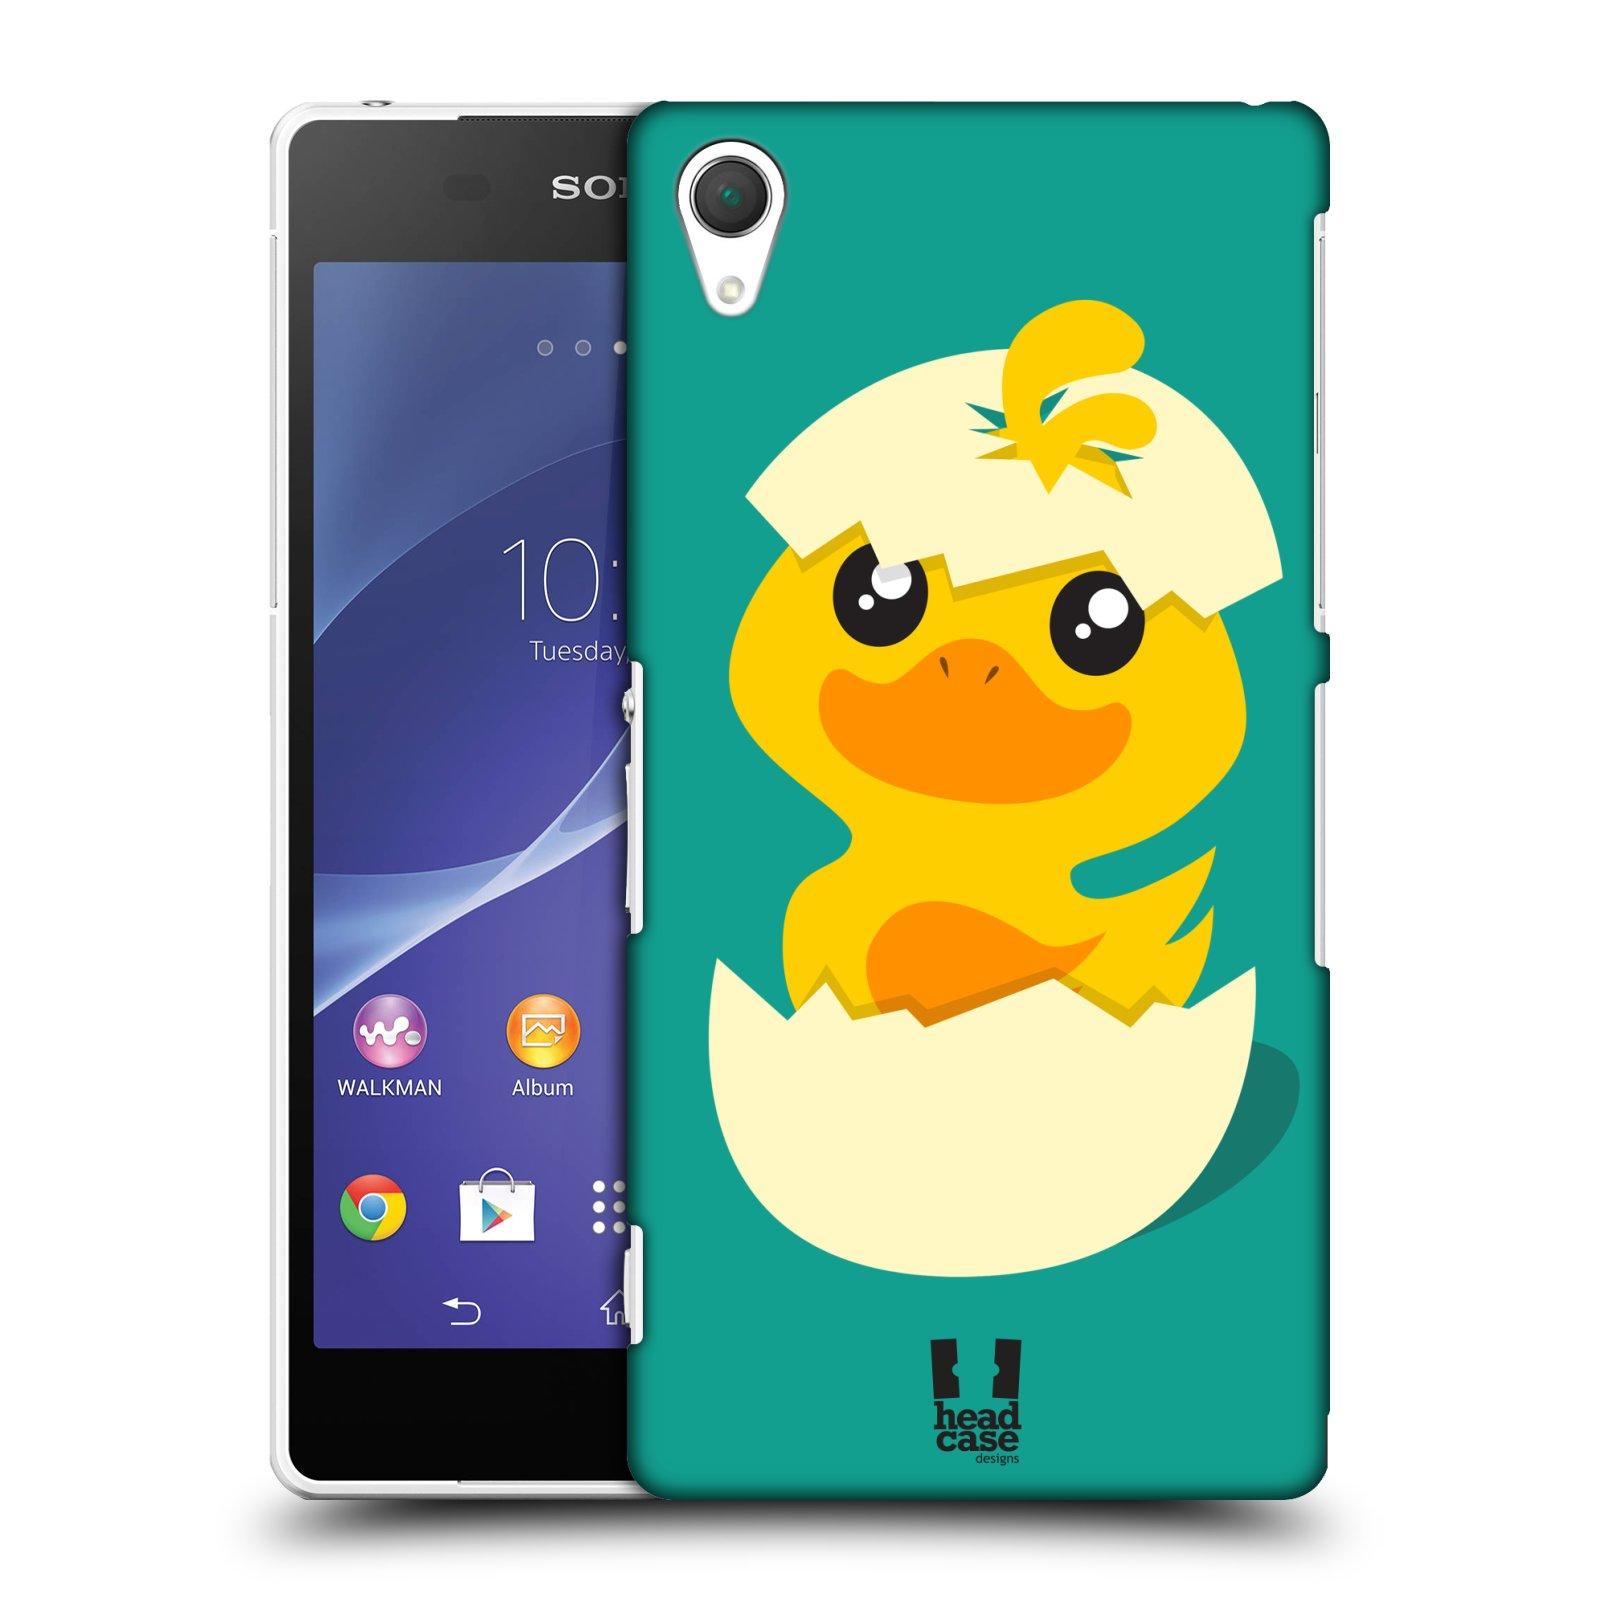 Plastové pouzdro na mobil Sony Xperia Z2 D6503 HEAD CASE KACHNIČKA Z VAJÍČKA (Kryt či obal na mobilní telefon Sony Xperia Z2 )